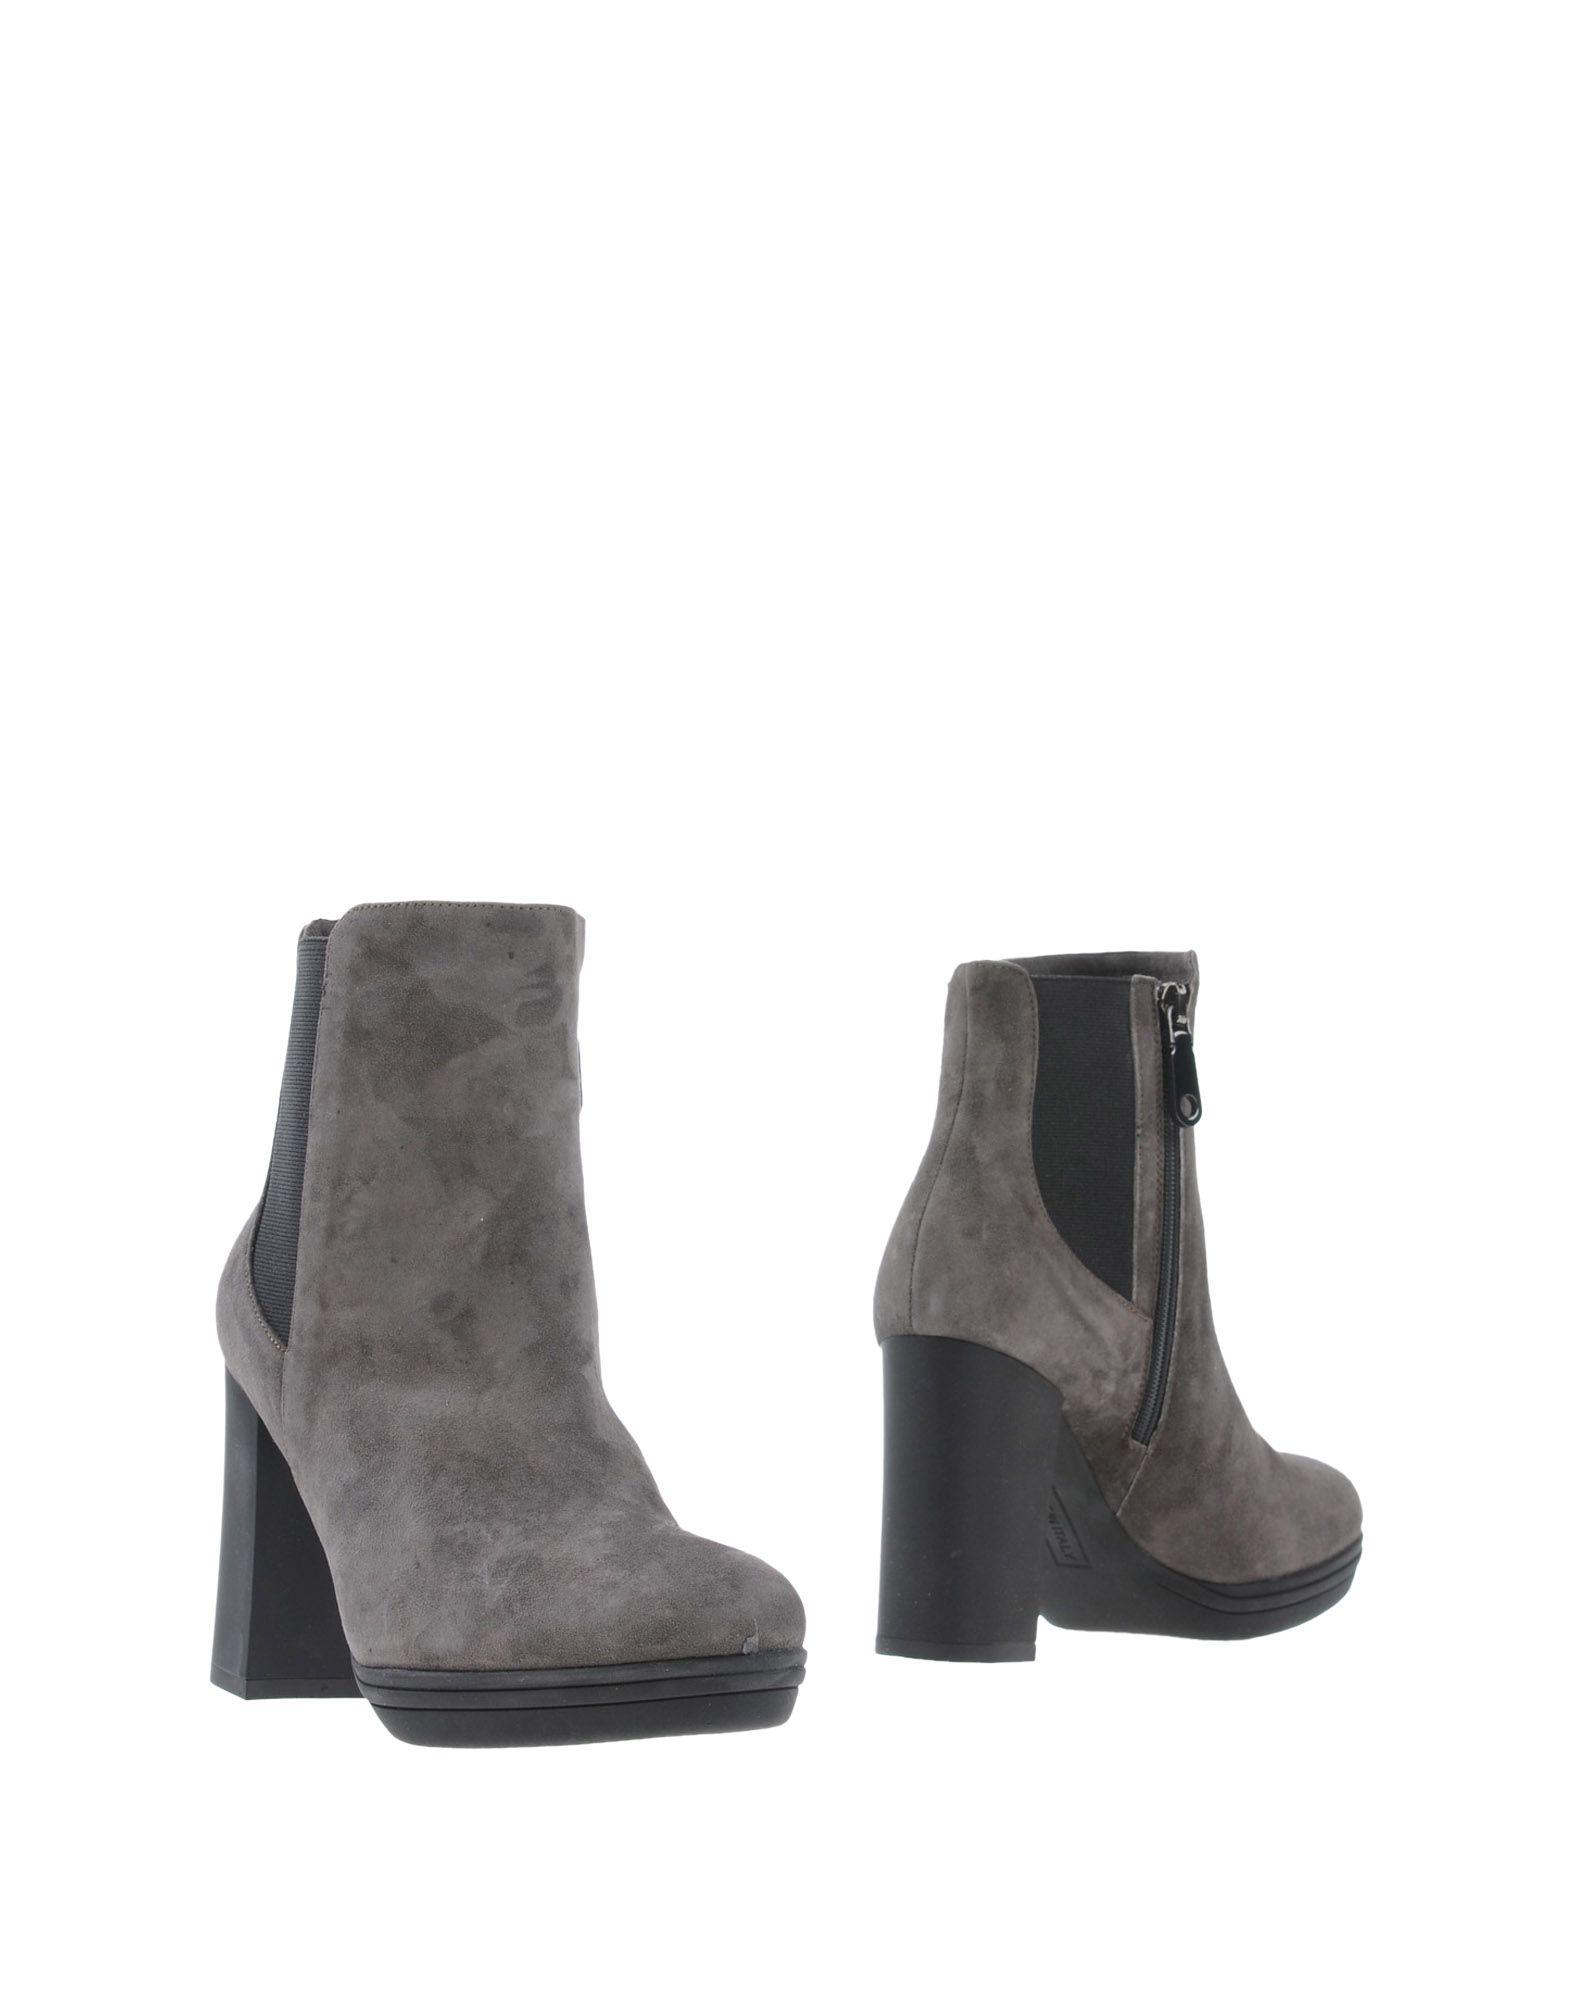 GAIA BARDELLI Полусапоги и высокие ботинки roland gaia sh 01